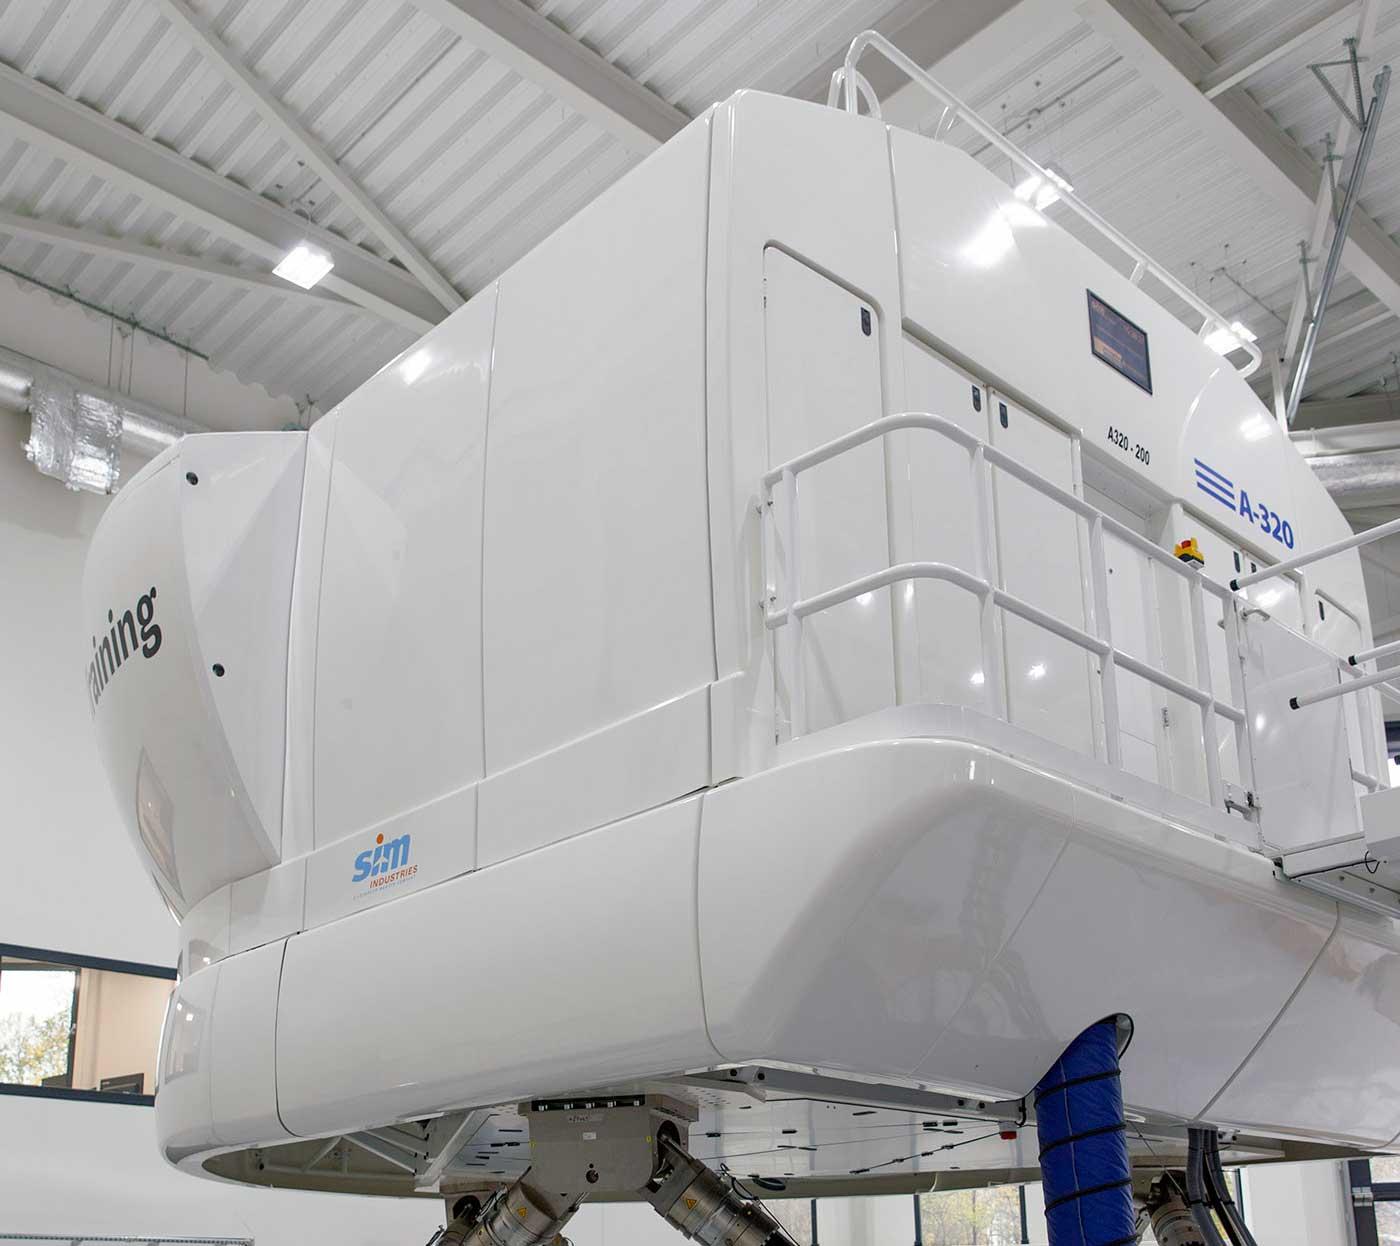 BAA Training A320 simulator